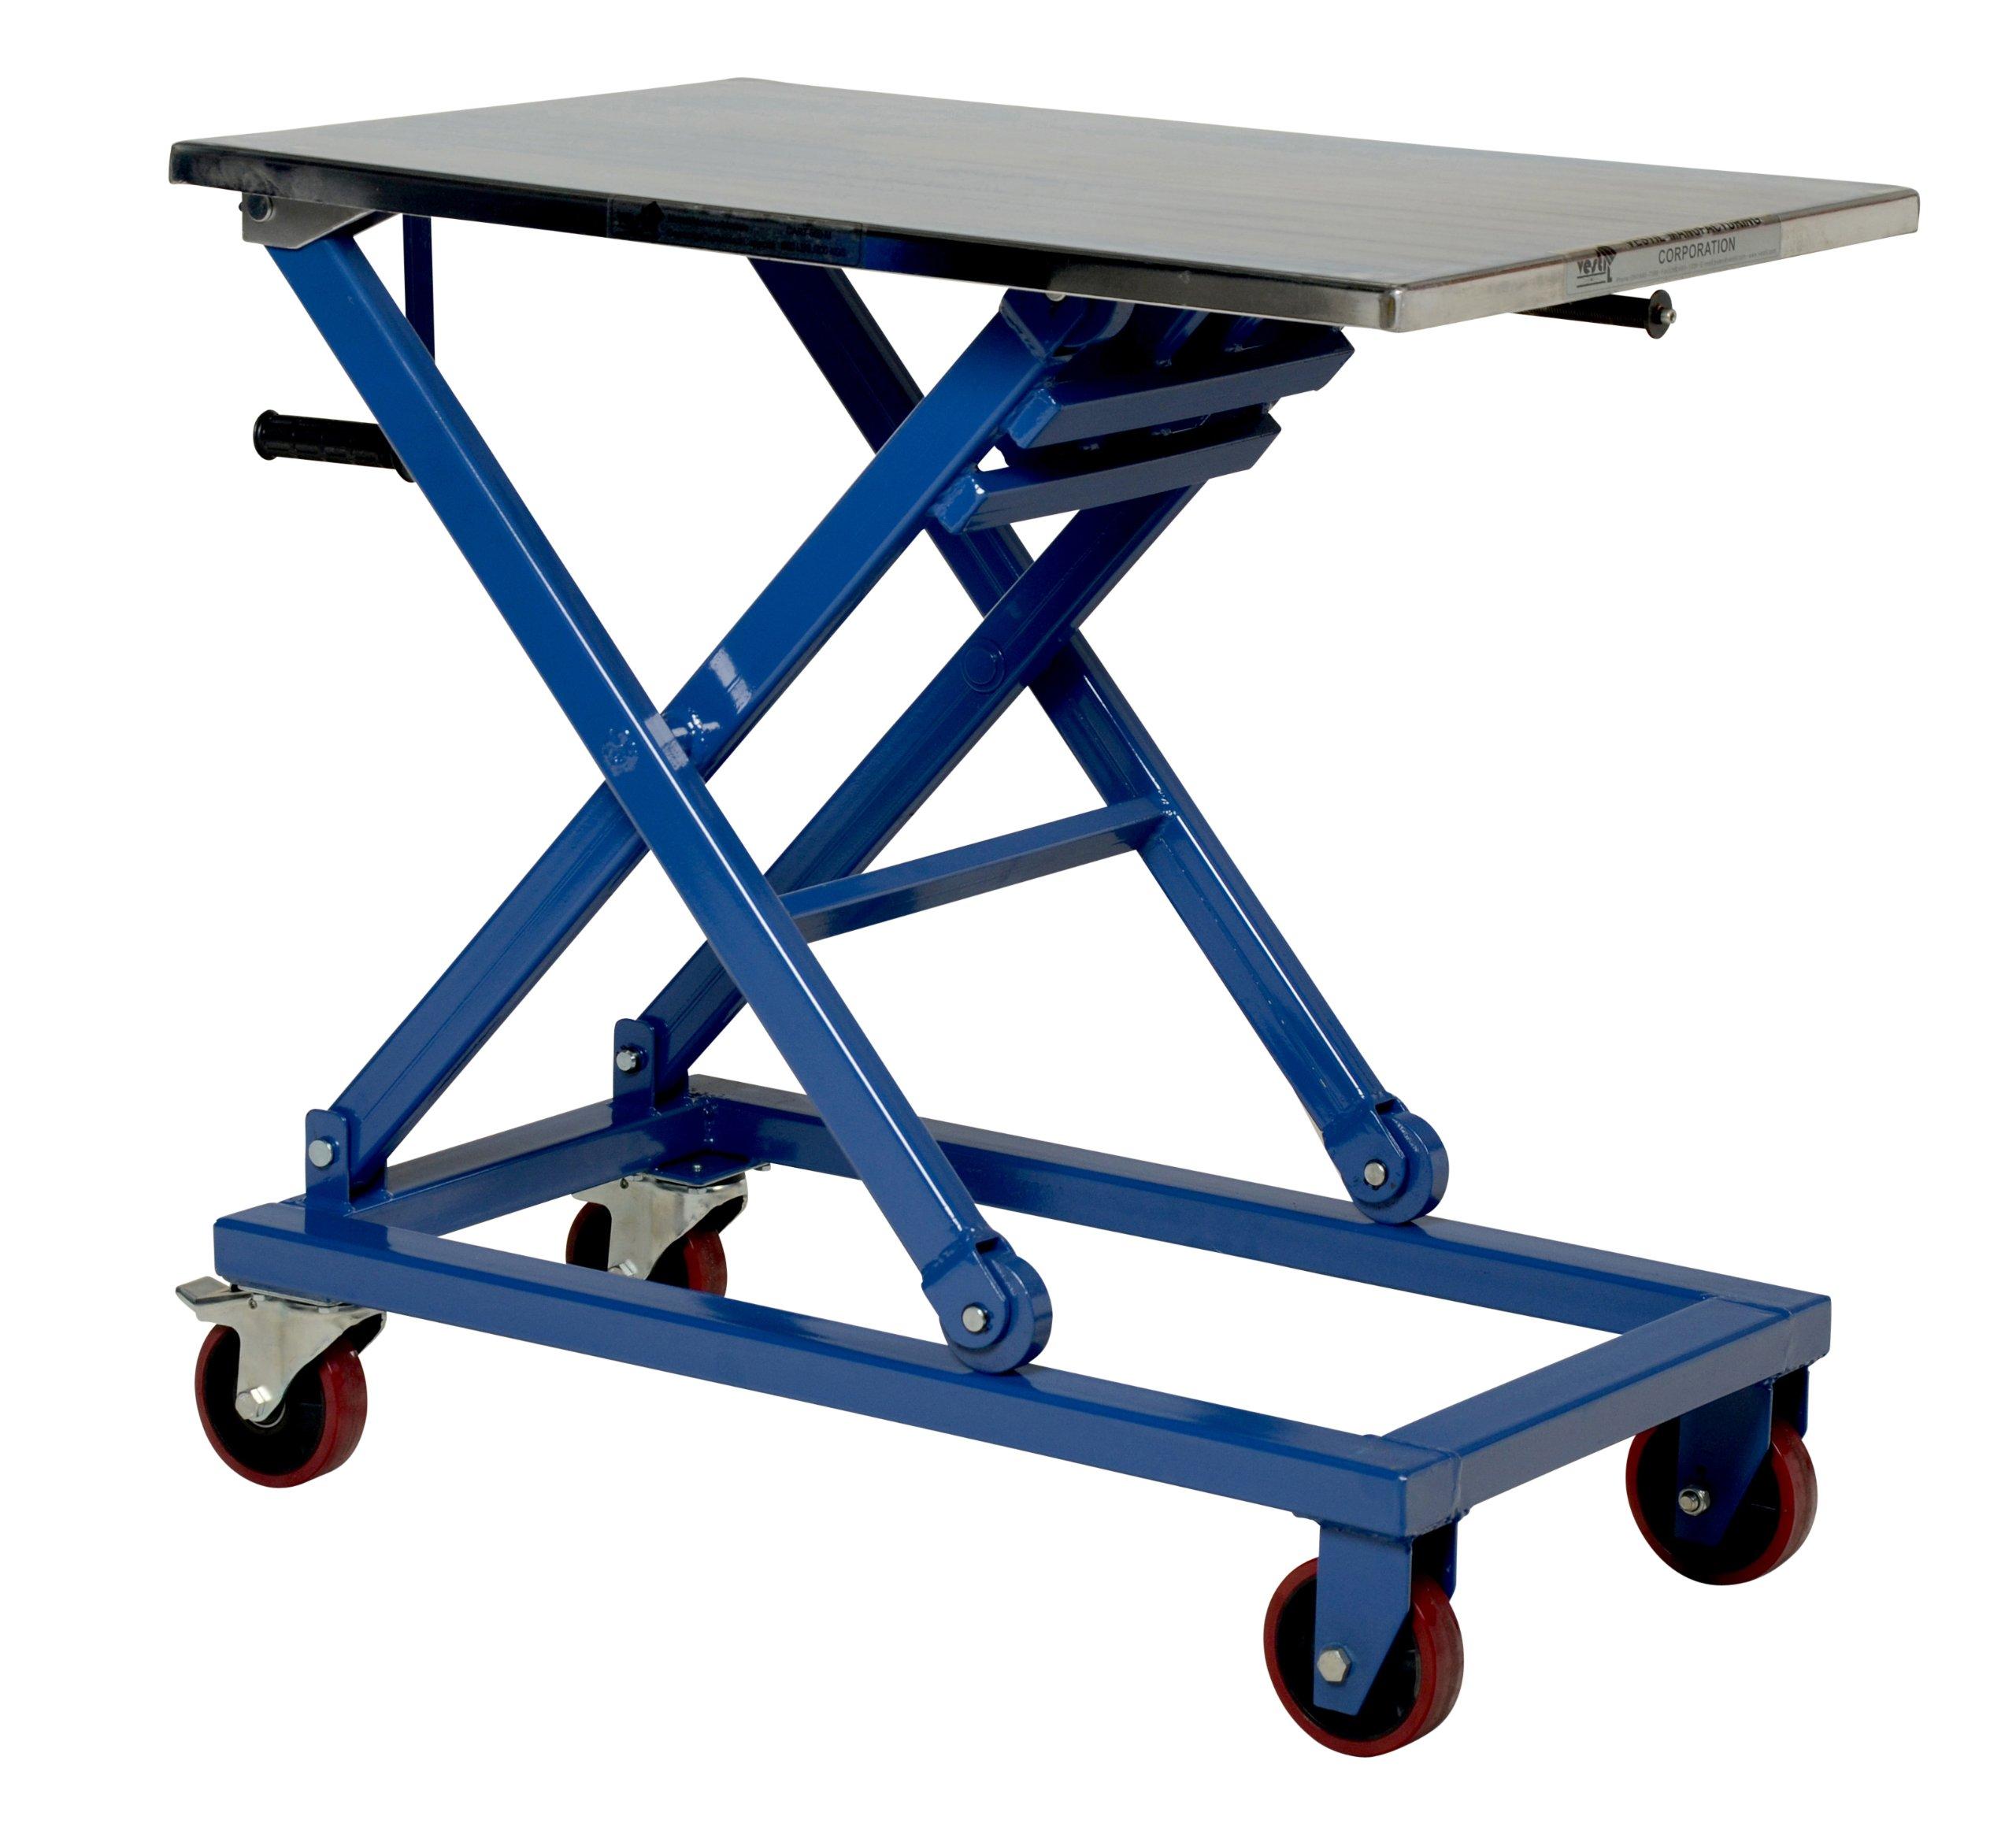 Vestil CART-660-M Steel Mechanical Scissor Cart, 660 lbs Capacity, 37'' Length x 23-1/2'' Width Platform, 17-1/4 - 39-1/4'' Height Range